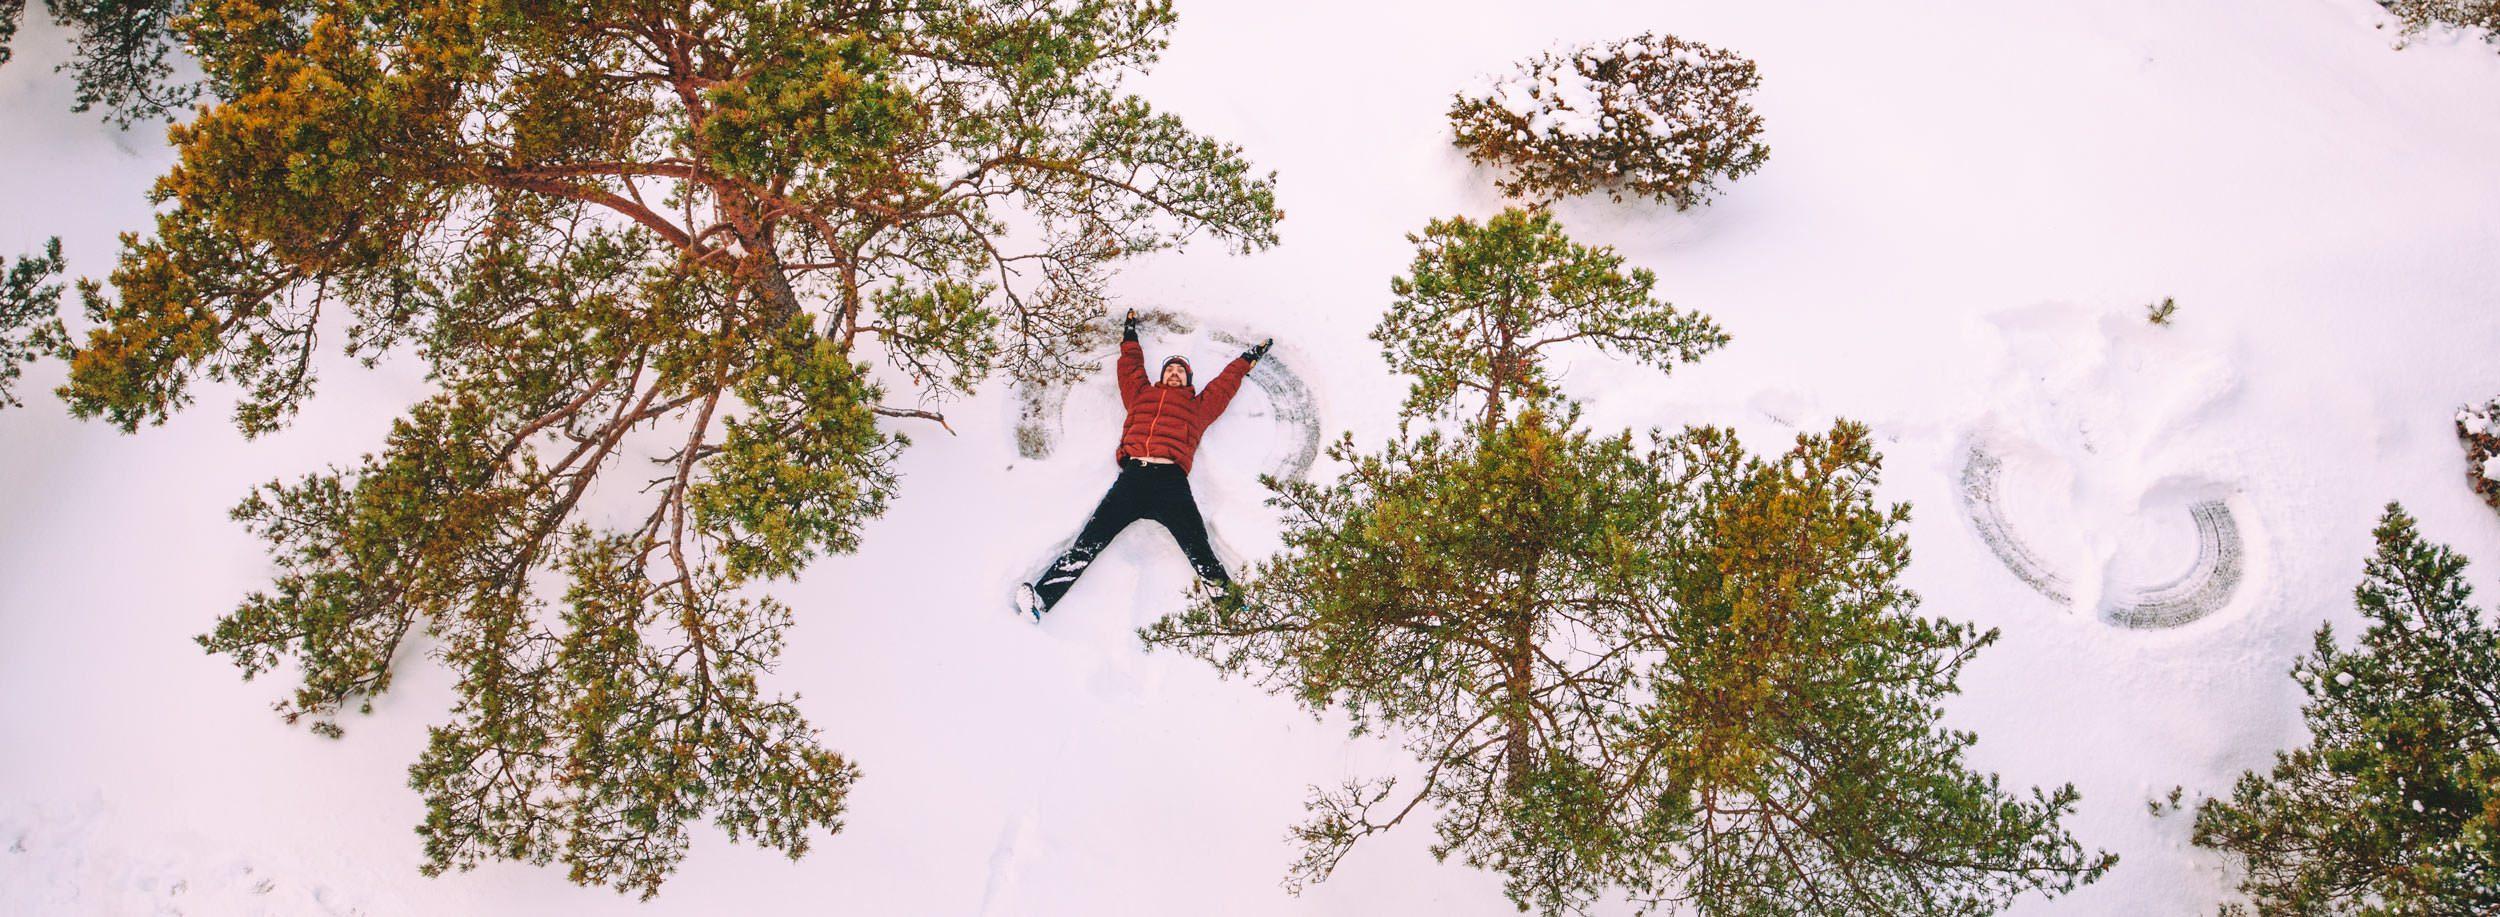 jak-fotografowac-zima